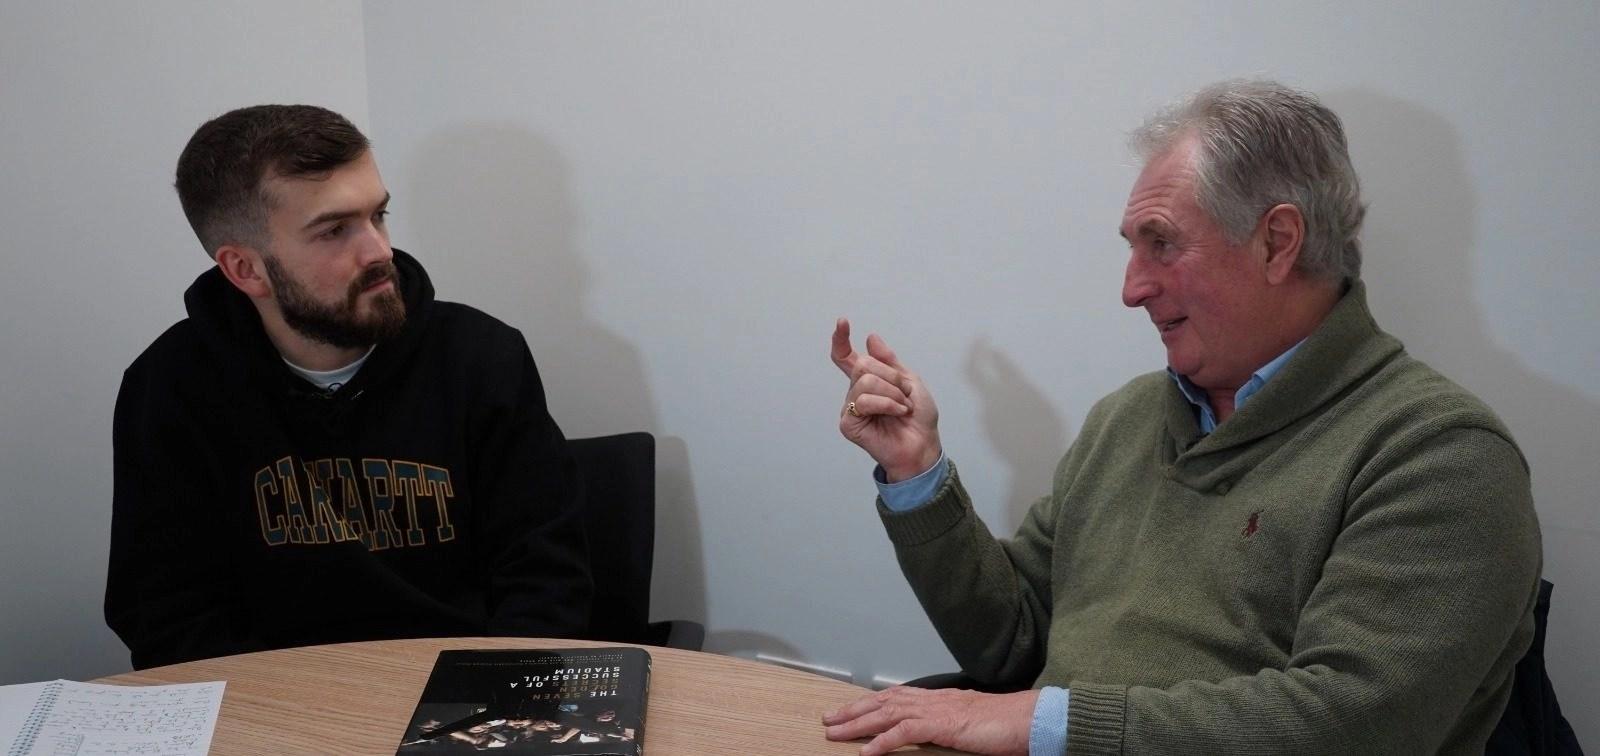 Jack Glennon | Co-Founder of Behind Sport